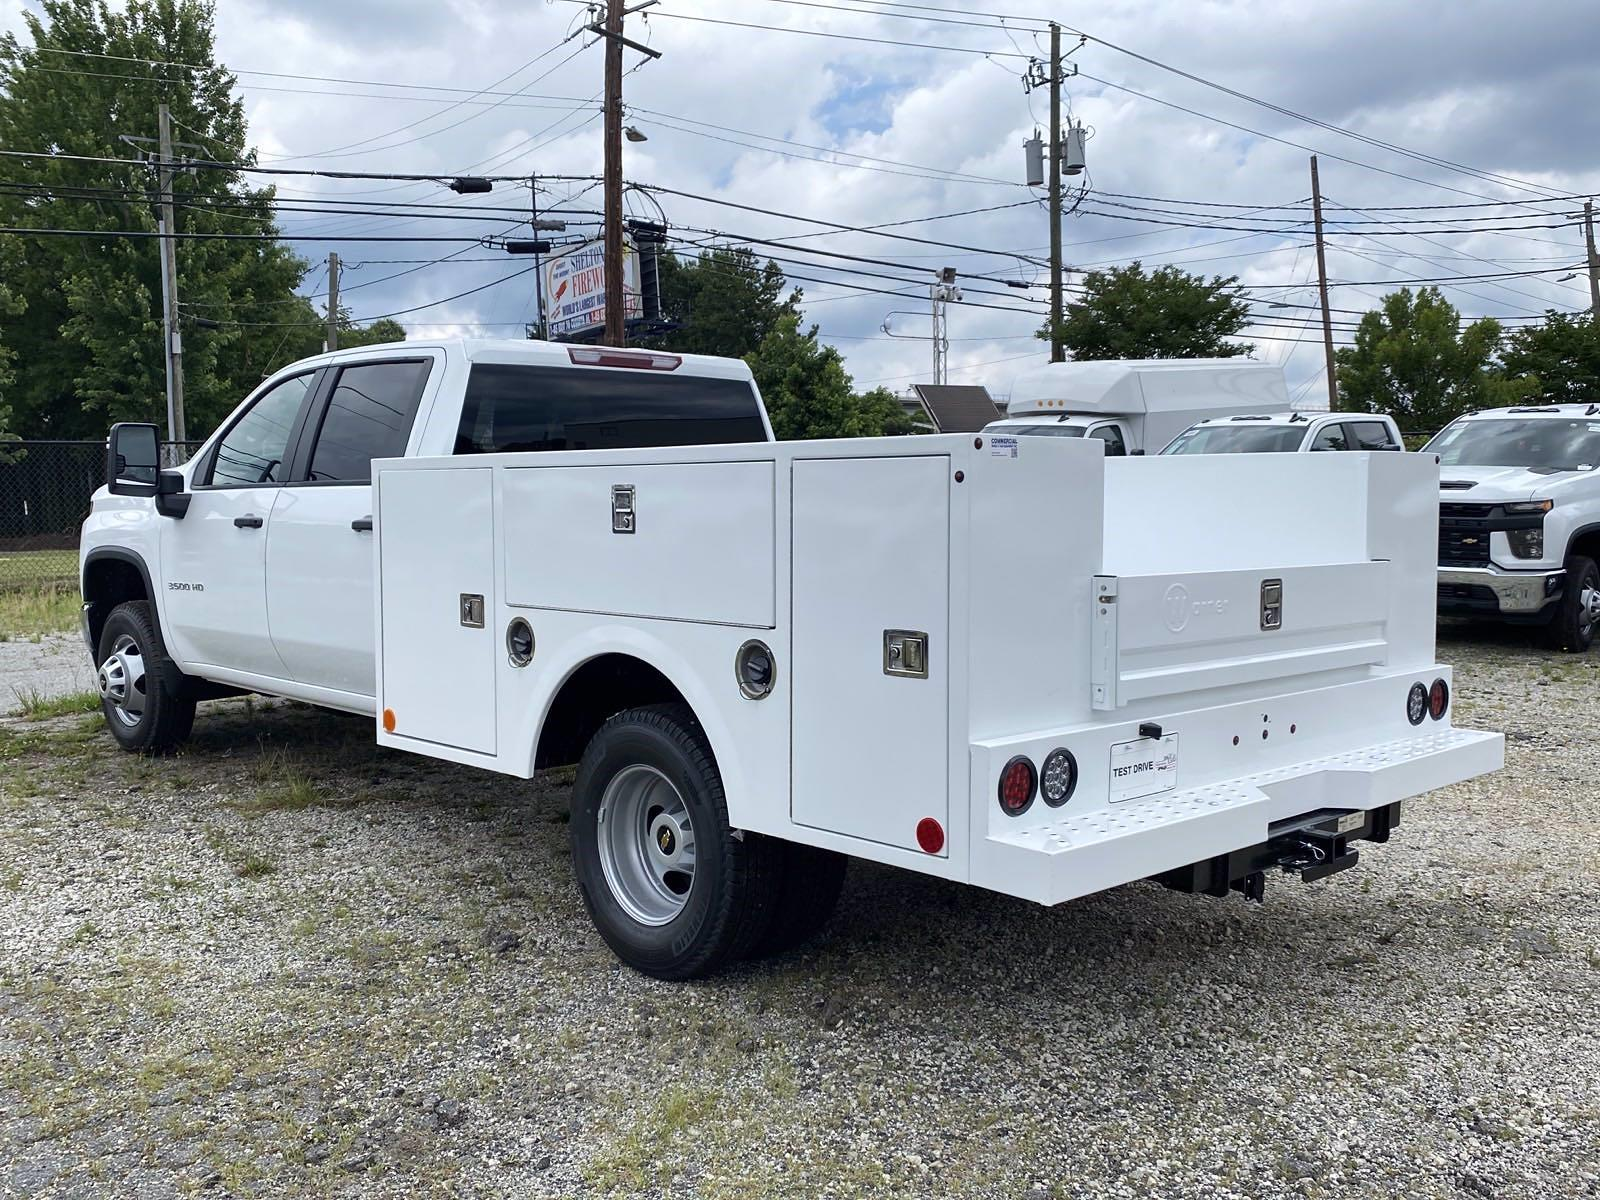 2021 Silverado 3500 Crew Cab 4x2,  Warner Truck Bodies Service Body #351028 - photo 2